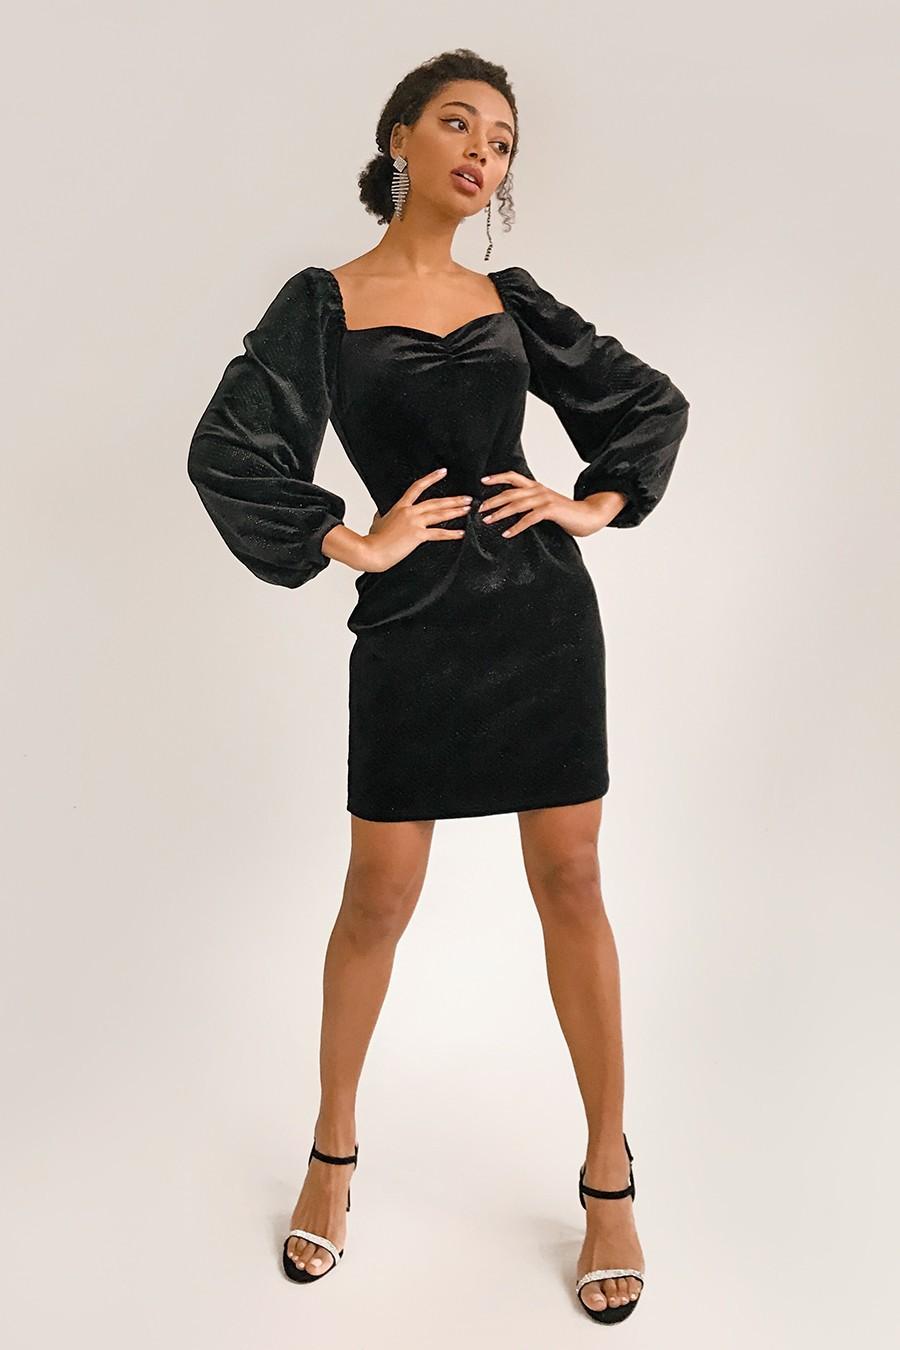 Платье мини из бархата с блестками черное - THE LACE